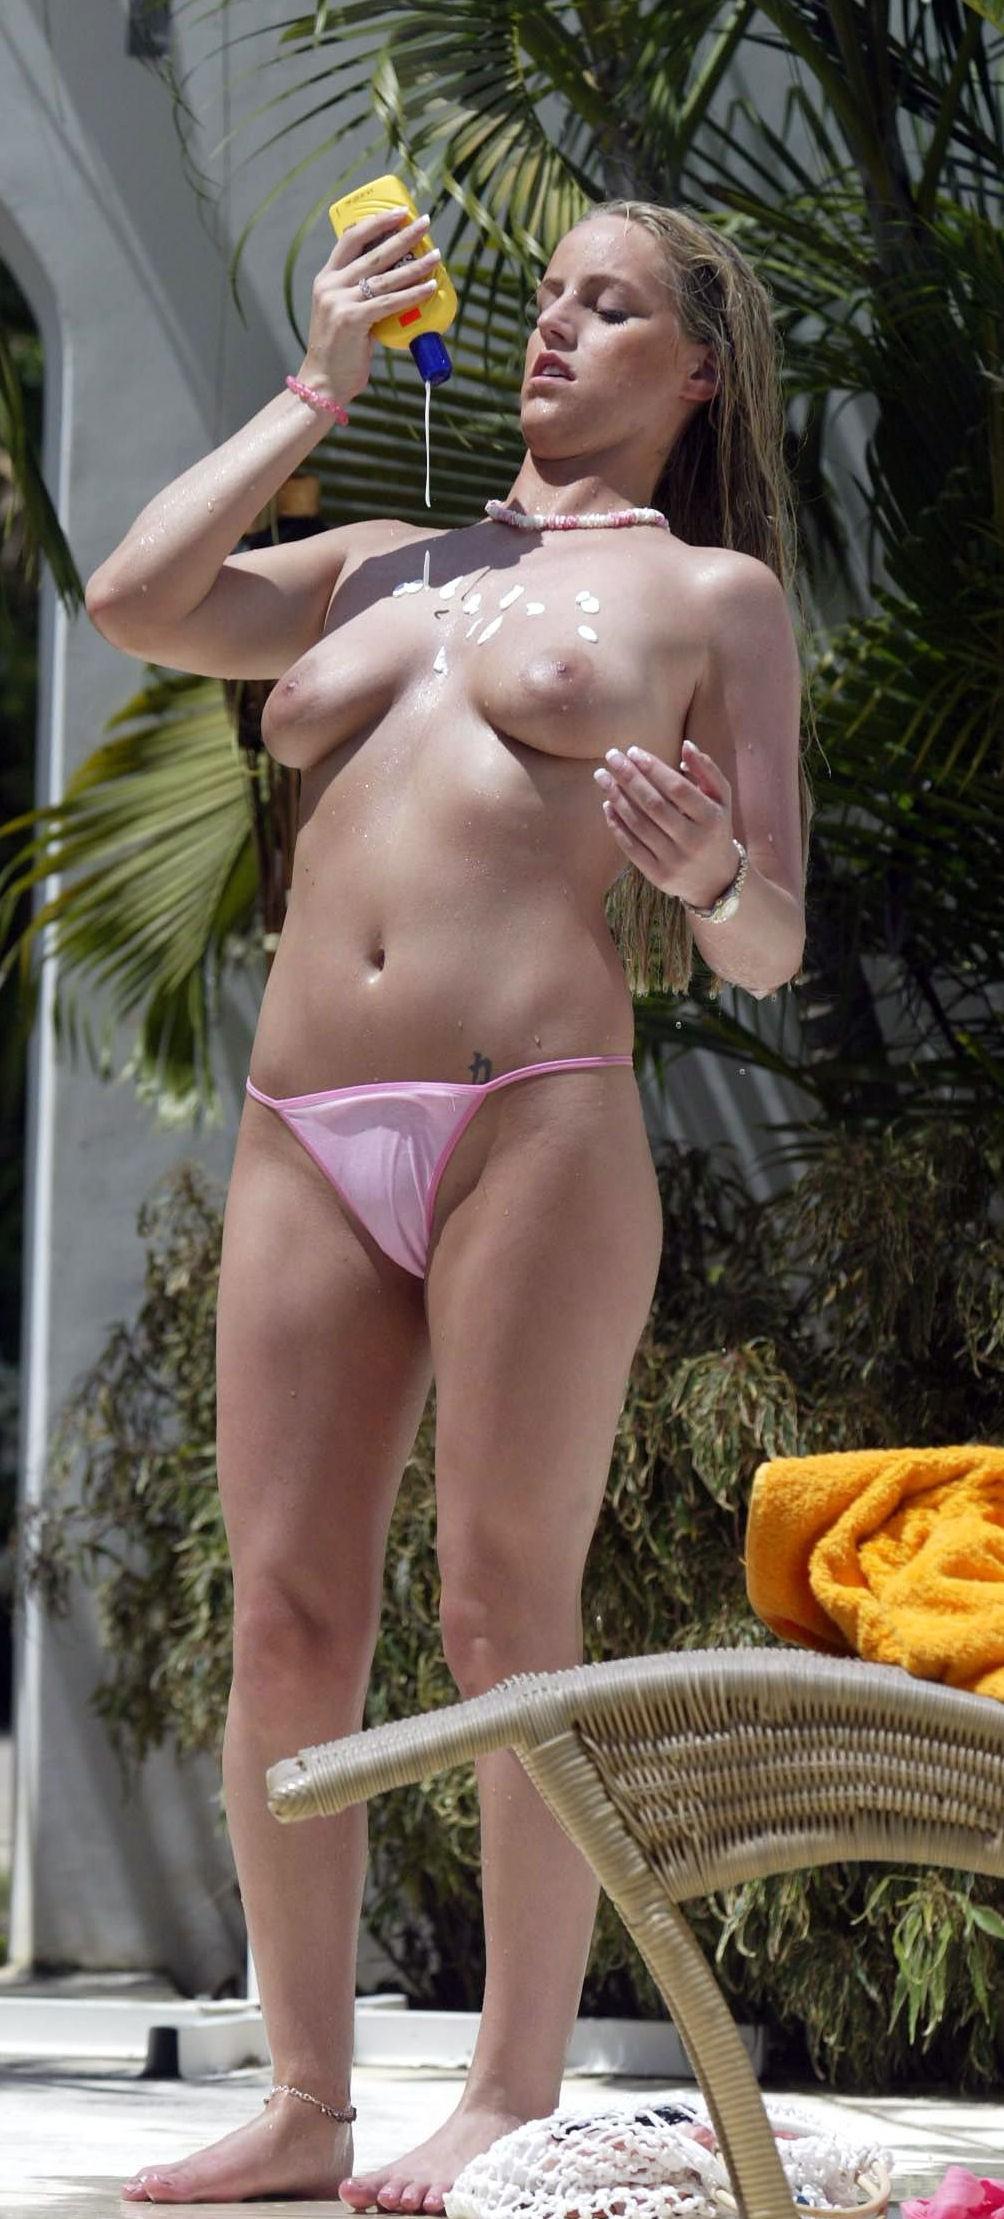 Danielle sellers nude photos